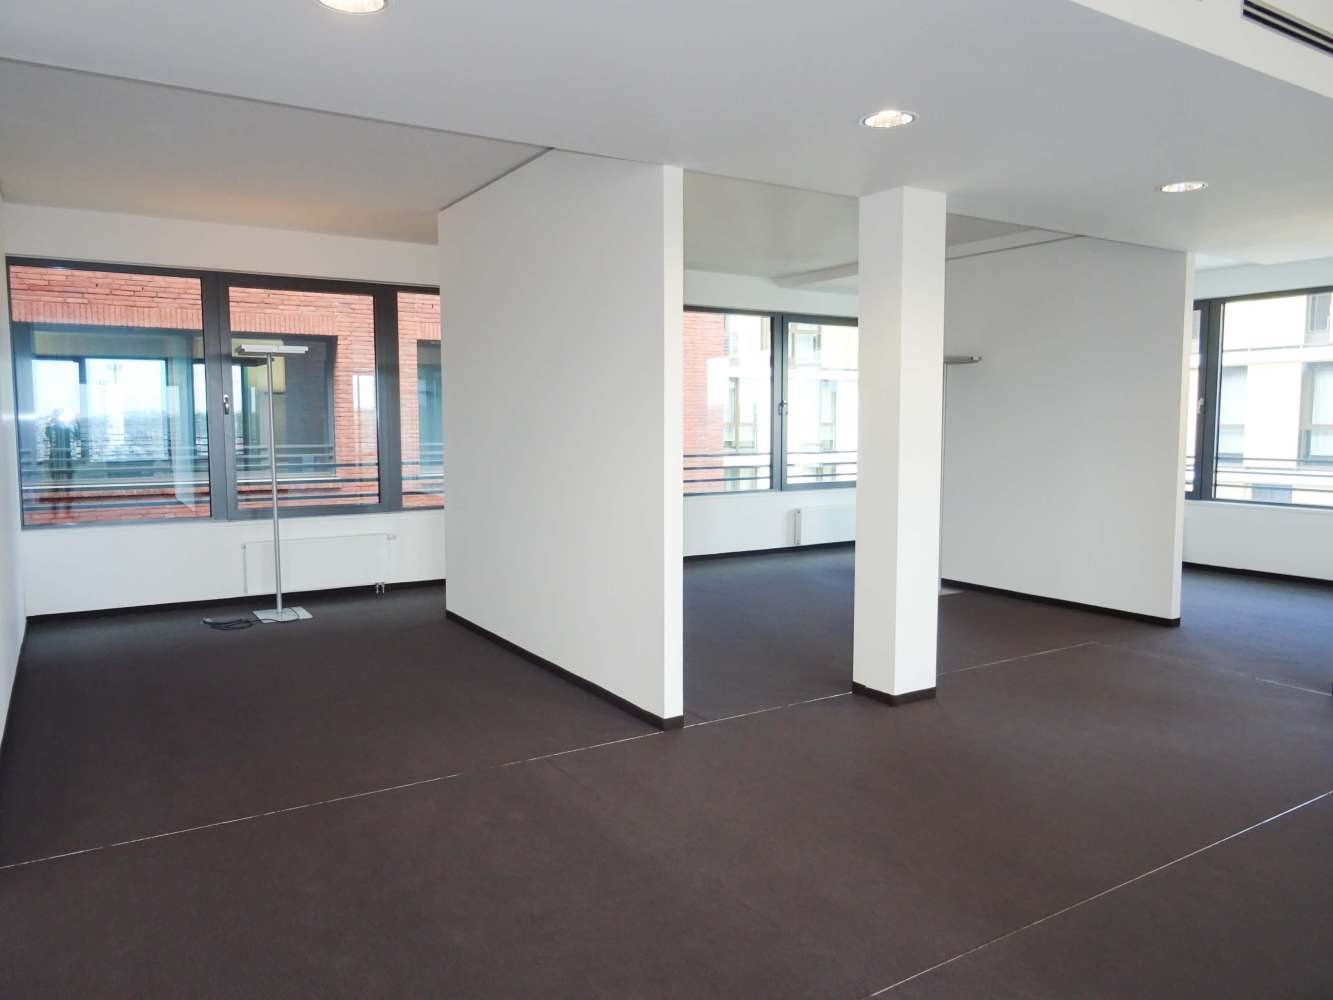 Büros Frankfurt am main, 60325 - Büro - Frankfurt am Main, Westend-Süd - F0995 - 10530000